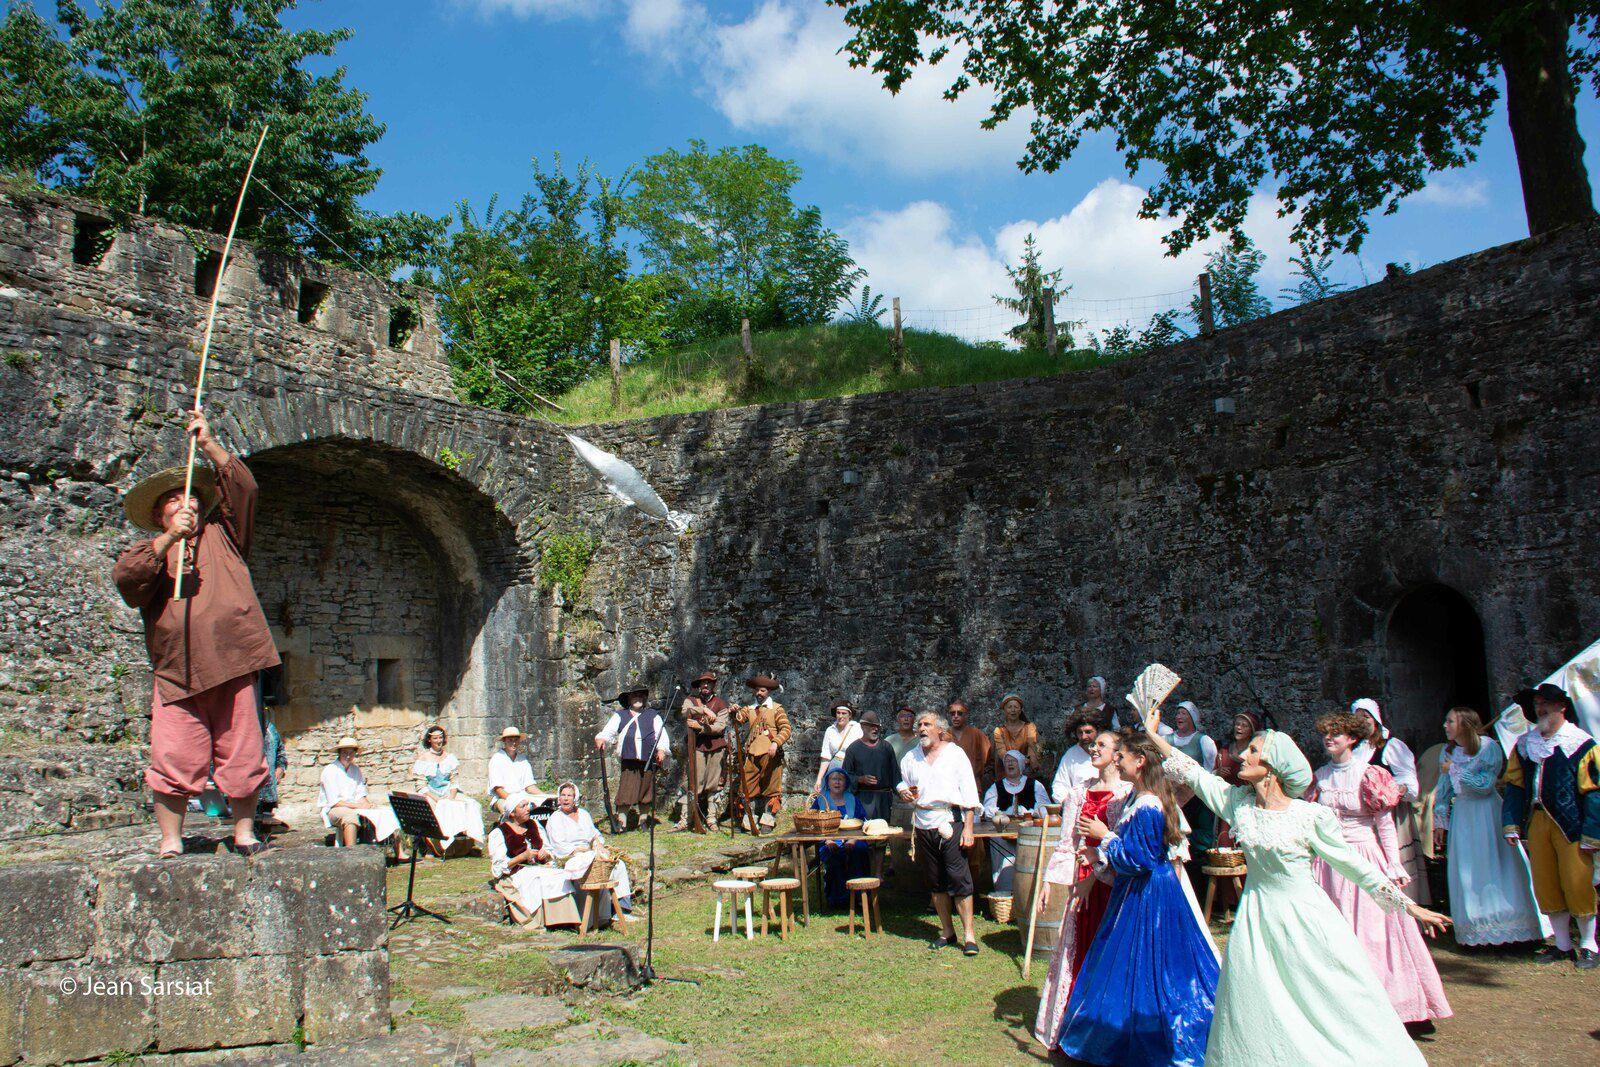 RECONSTITUTION : IL Y A 4 SIECLES, LOUIS XIII DEBARQUAIT A NAVARRENX POUR RETABLIR SON AUTORITE